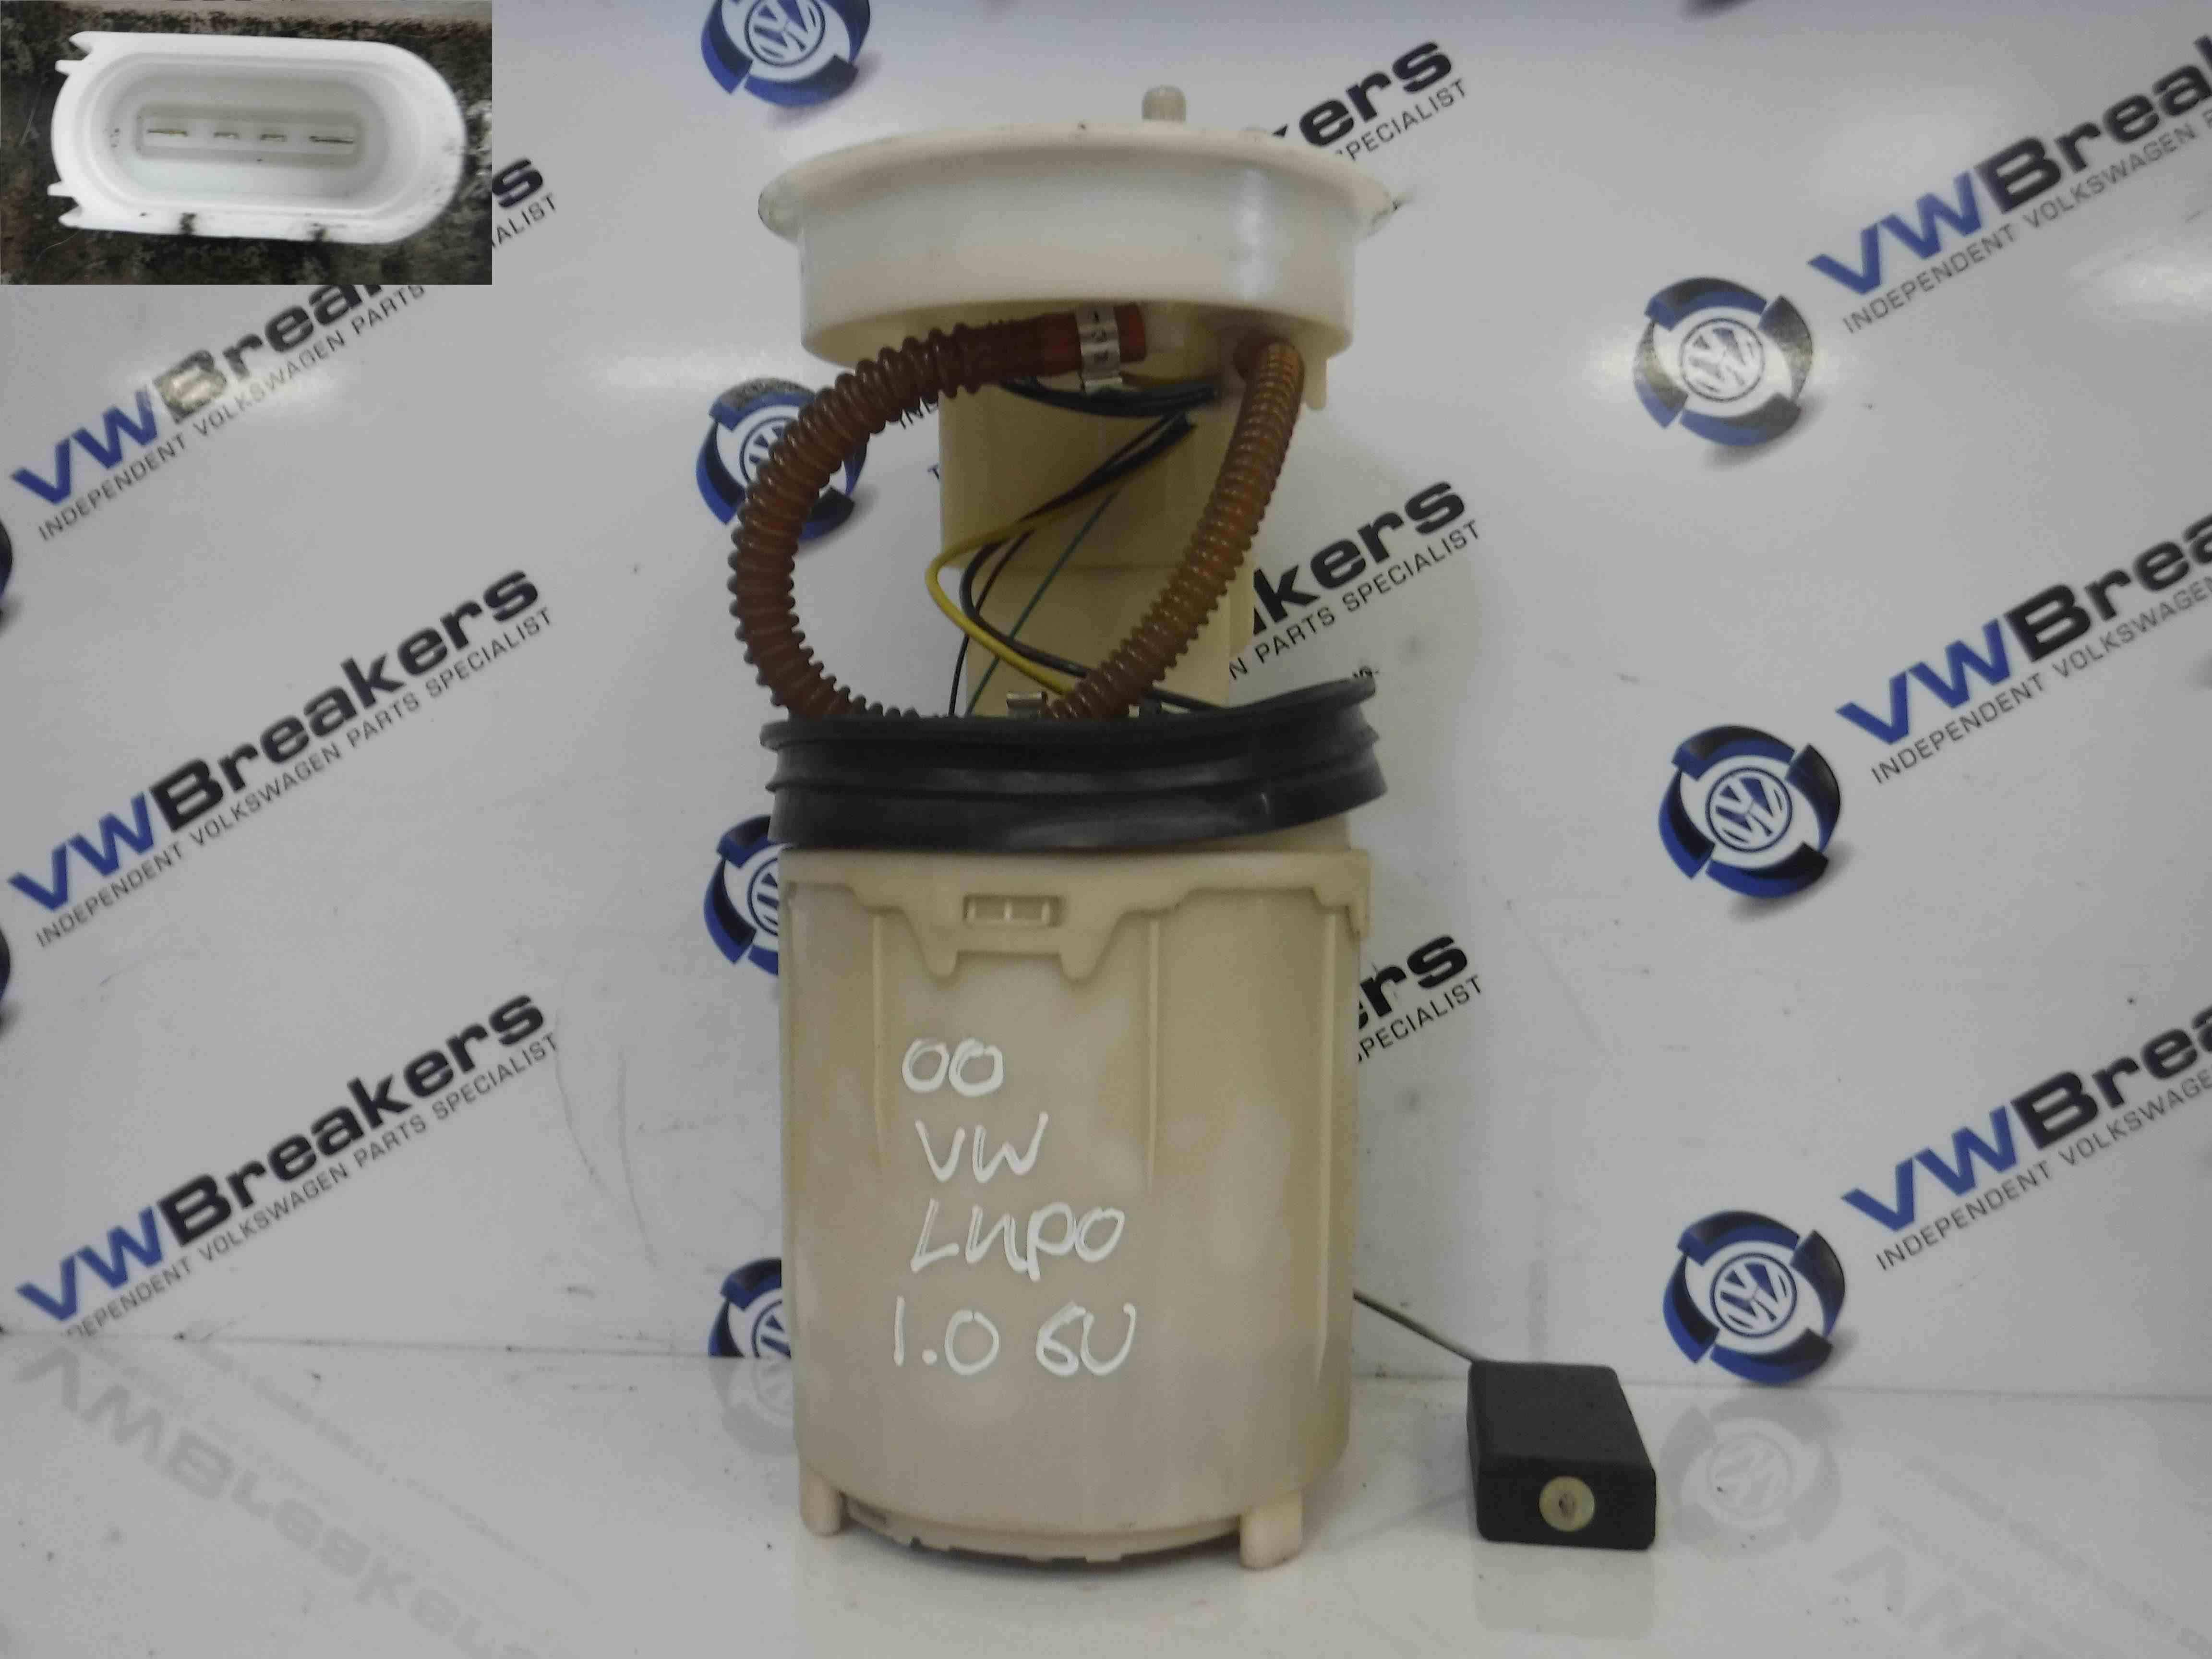 2006 Volkswagen Jetta 2.5 >> Volkswagen Lupo 1998-2005 Petrol Fuel Tank Sender Unit Pump 6X0919051G - Store - Used Volkswagen ...